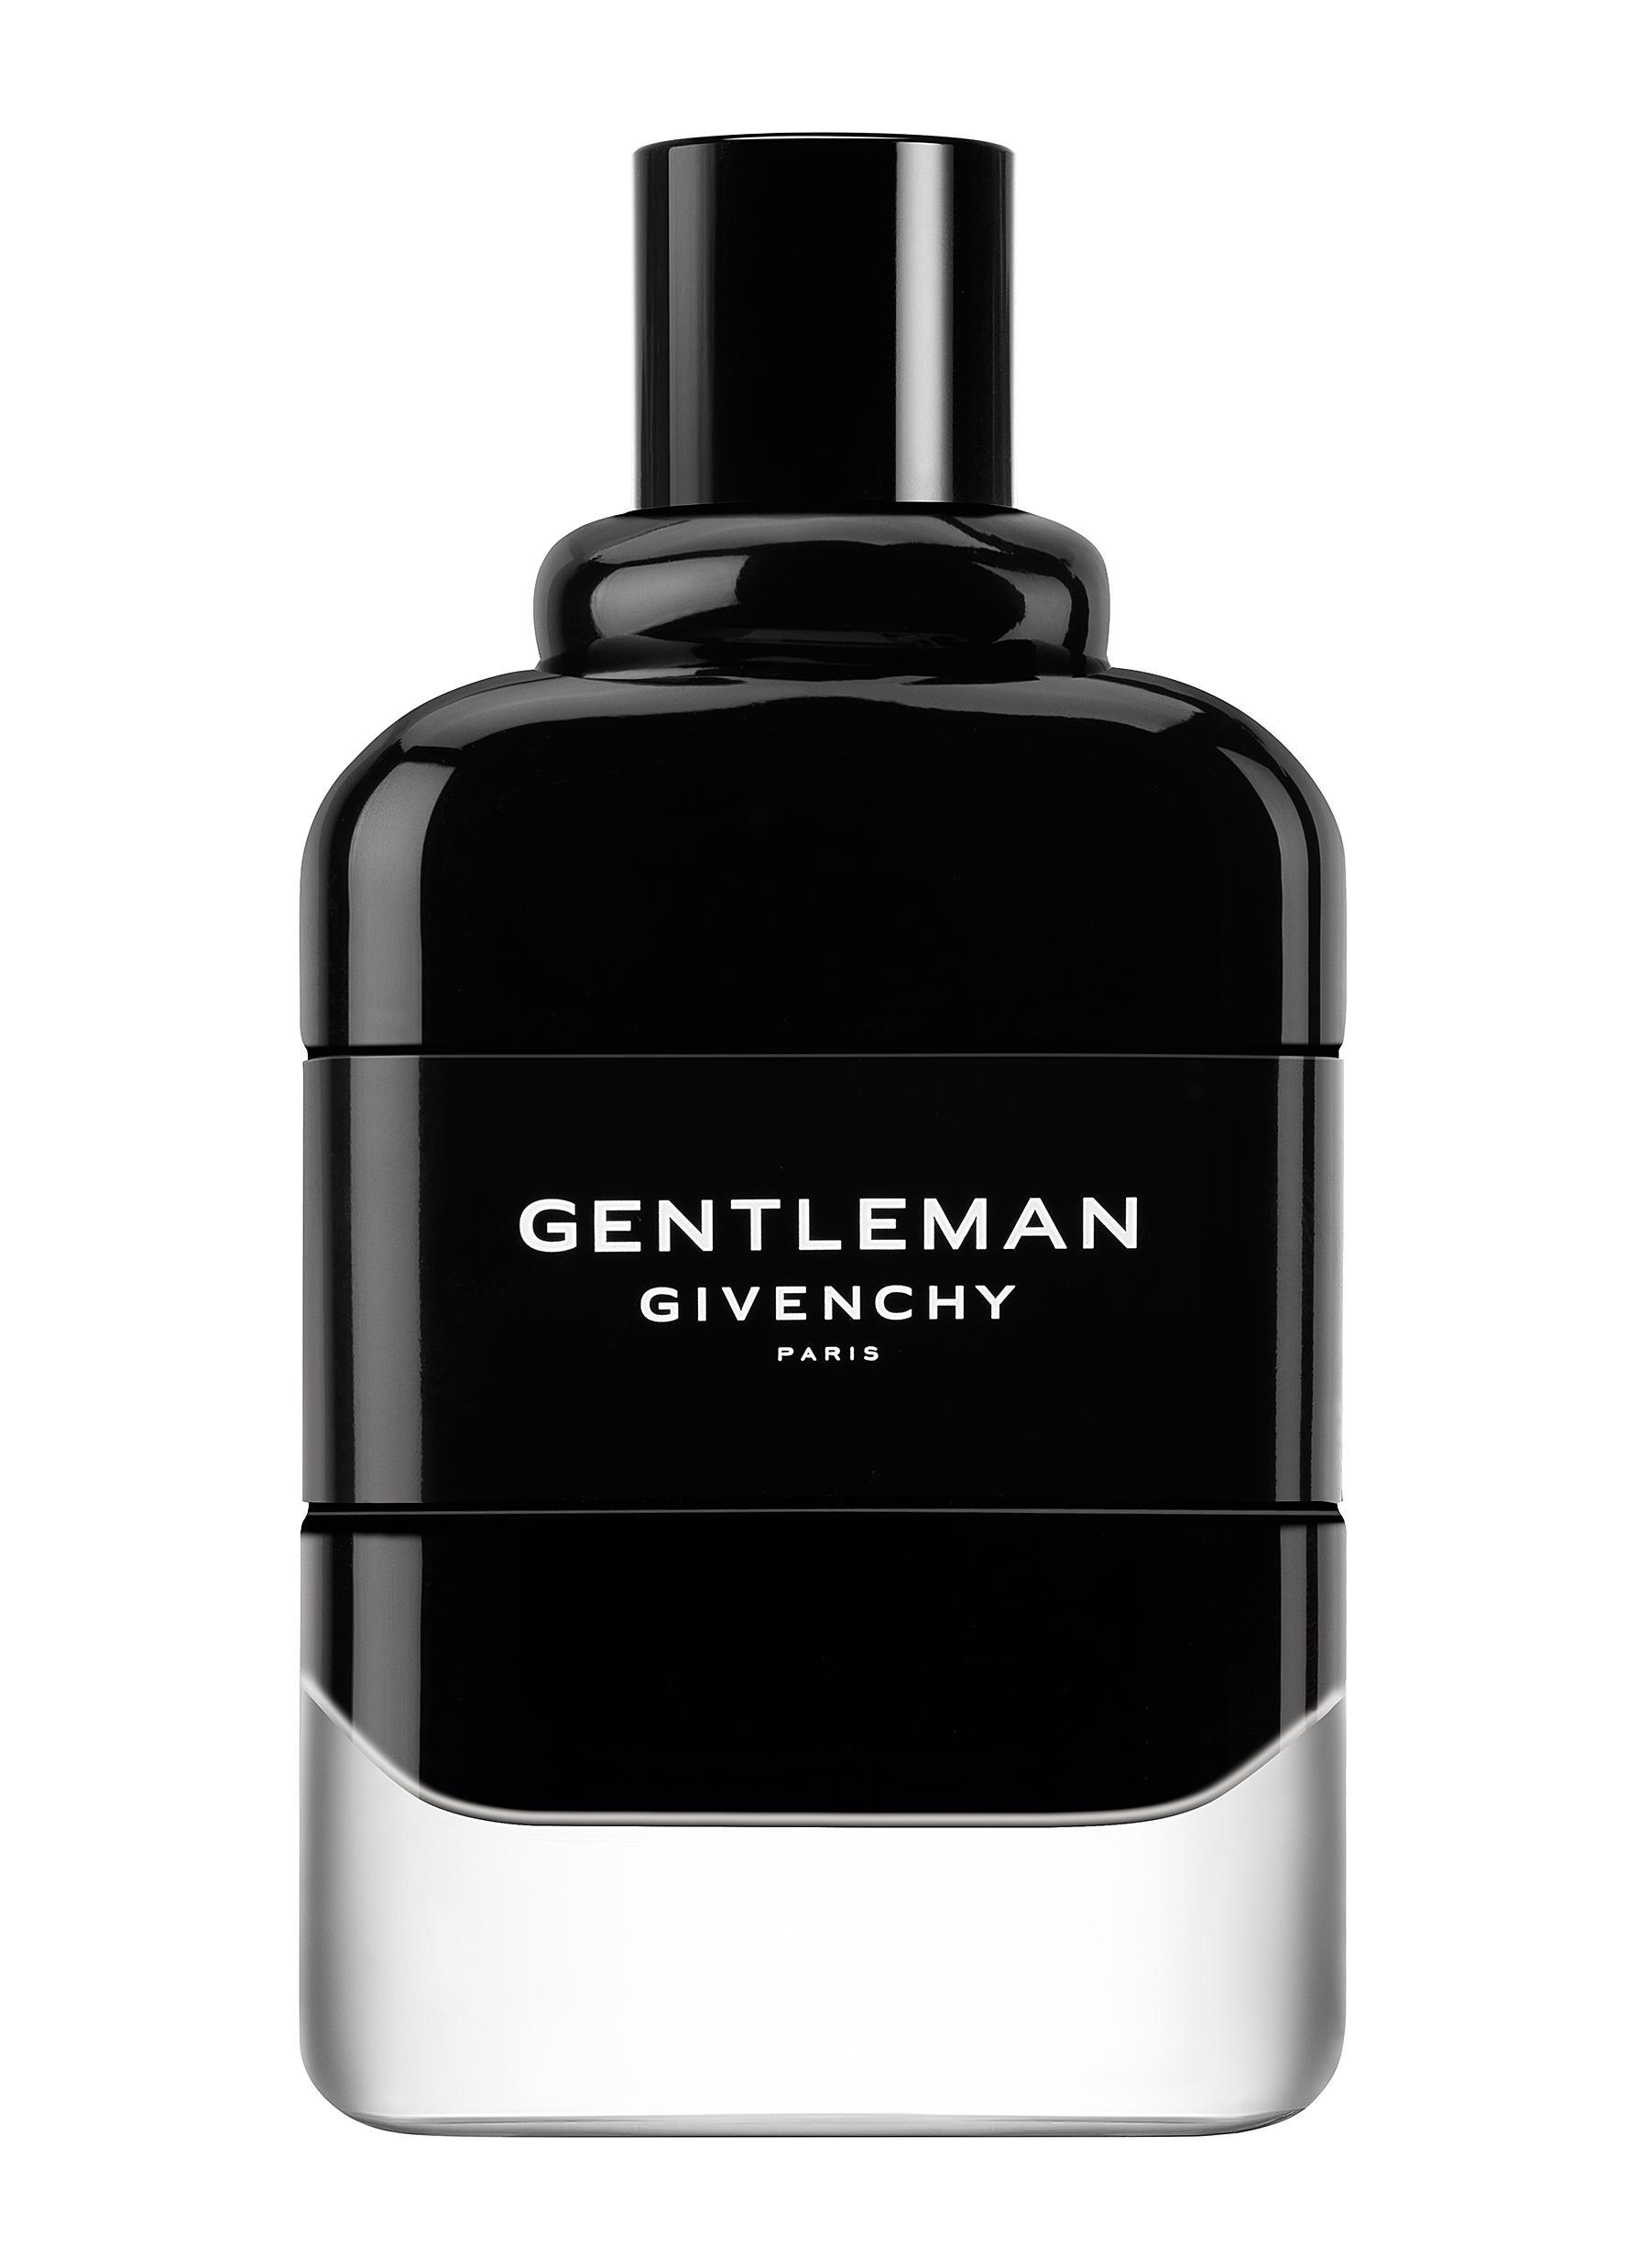 Givenchy Beauty Gentleman Givenchy Eau De Parfum 100ml Grooming